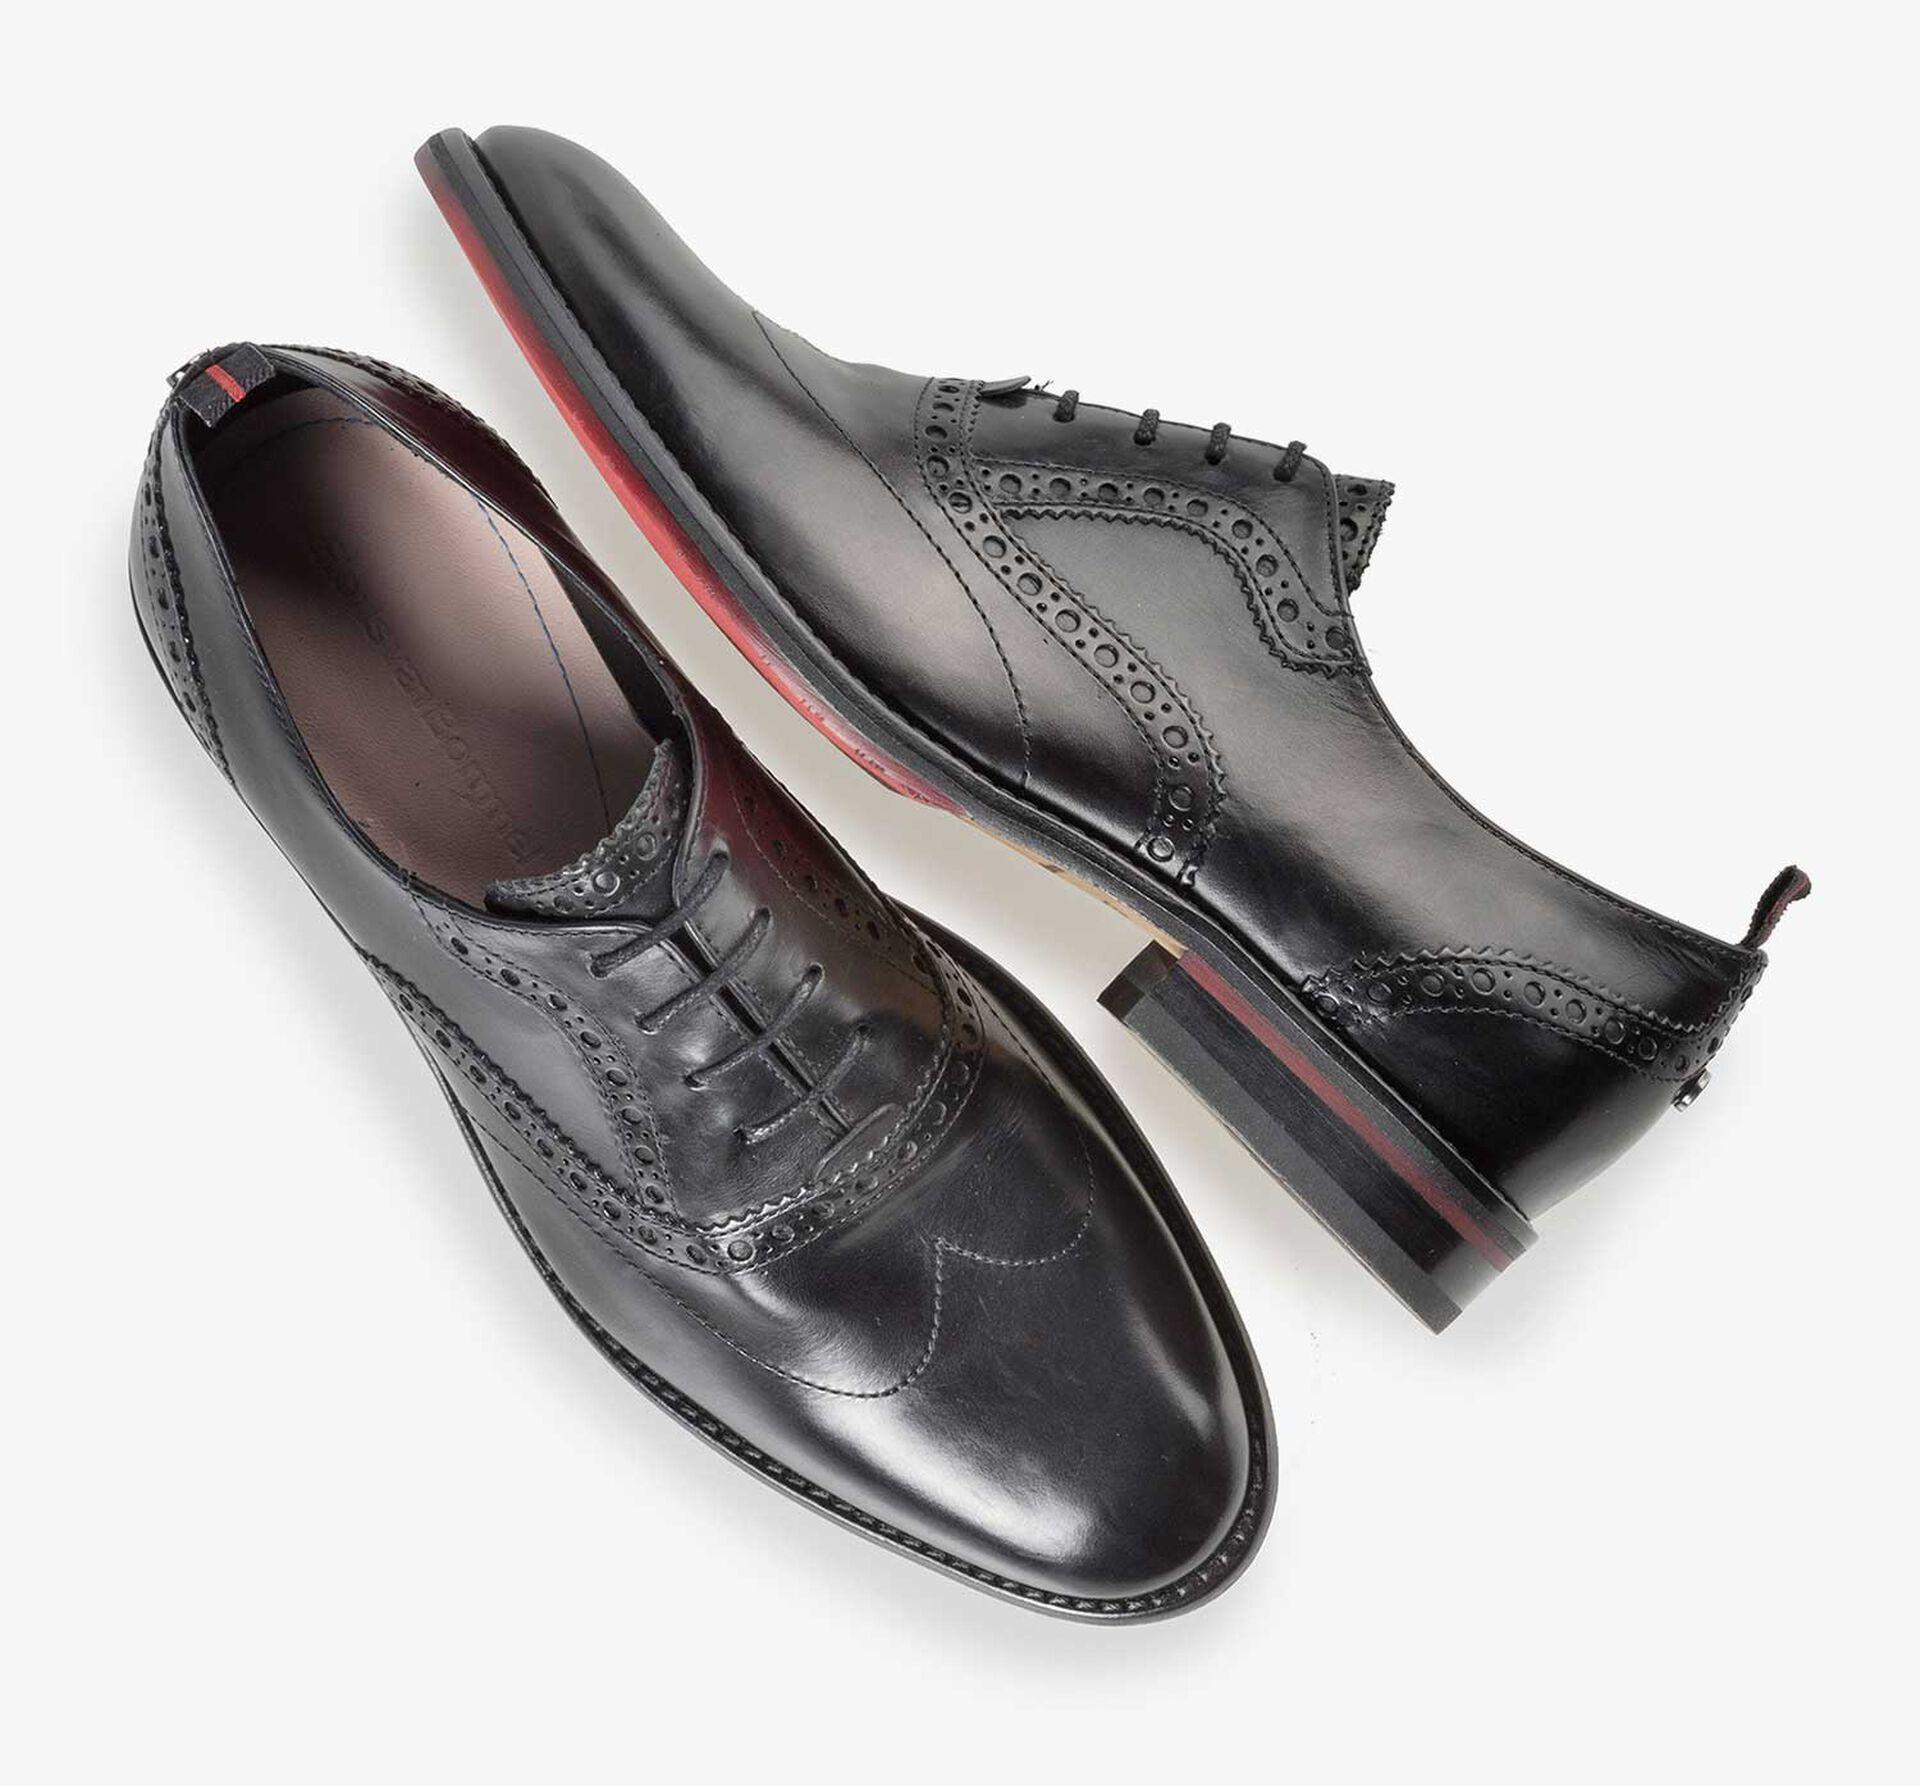 Black leather brogue lace shoe